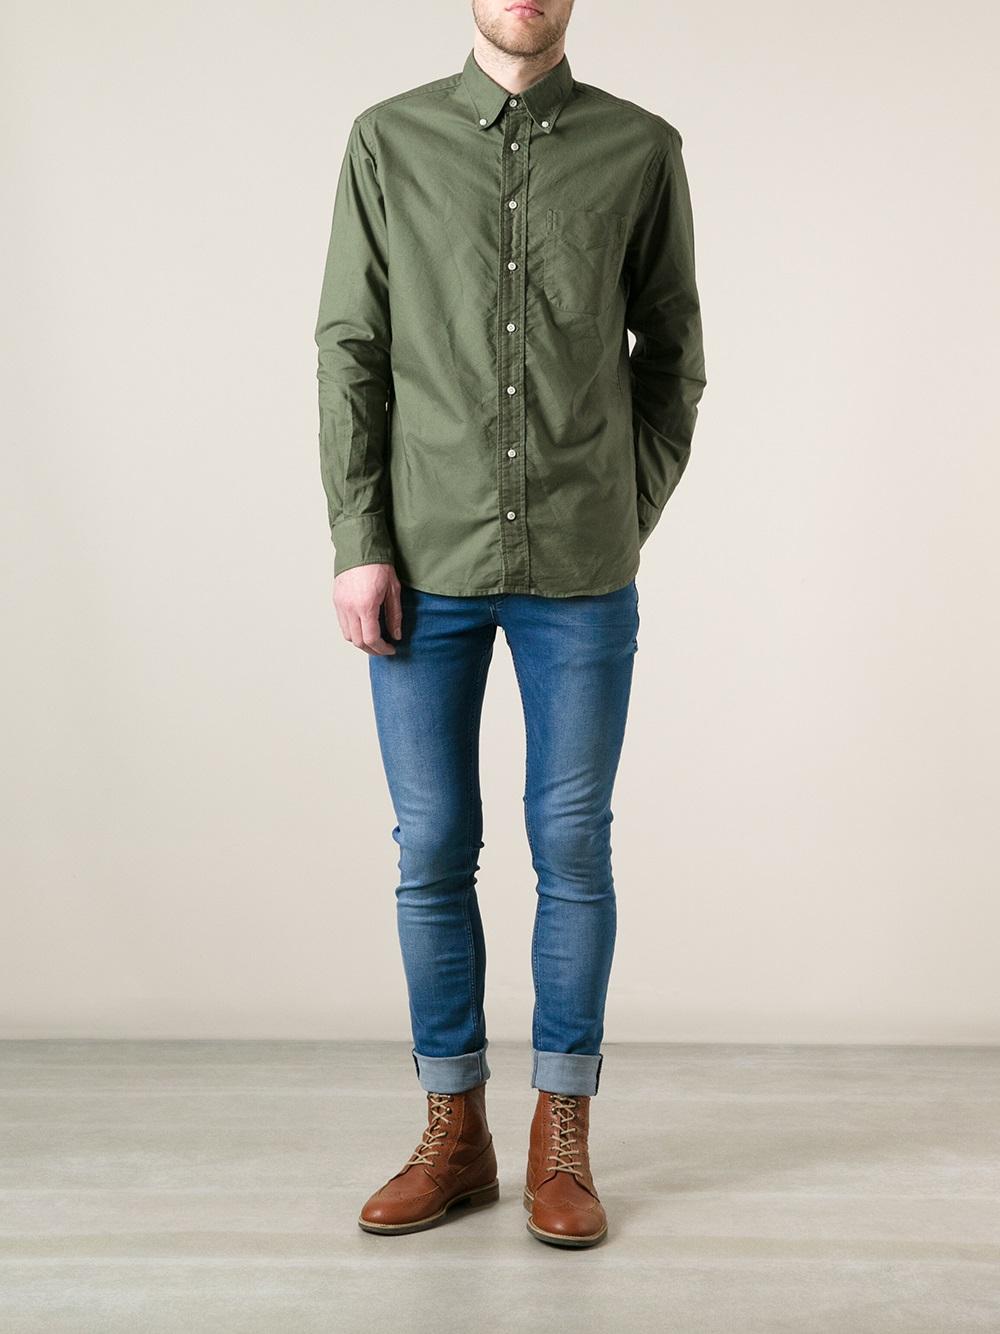 Lyst - Gitman bros Button Down Shirt in Green for Men